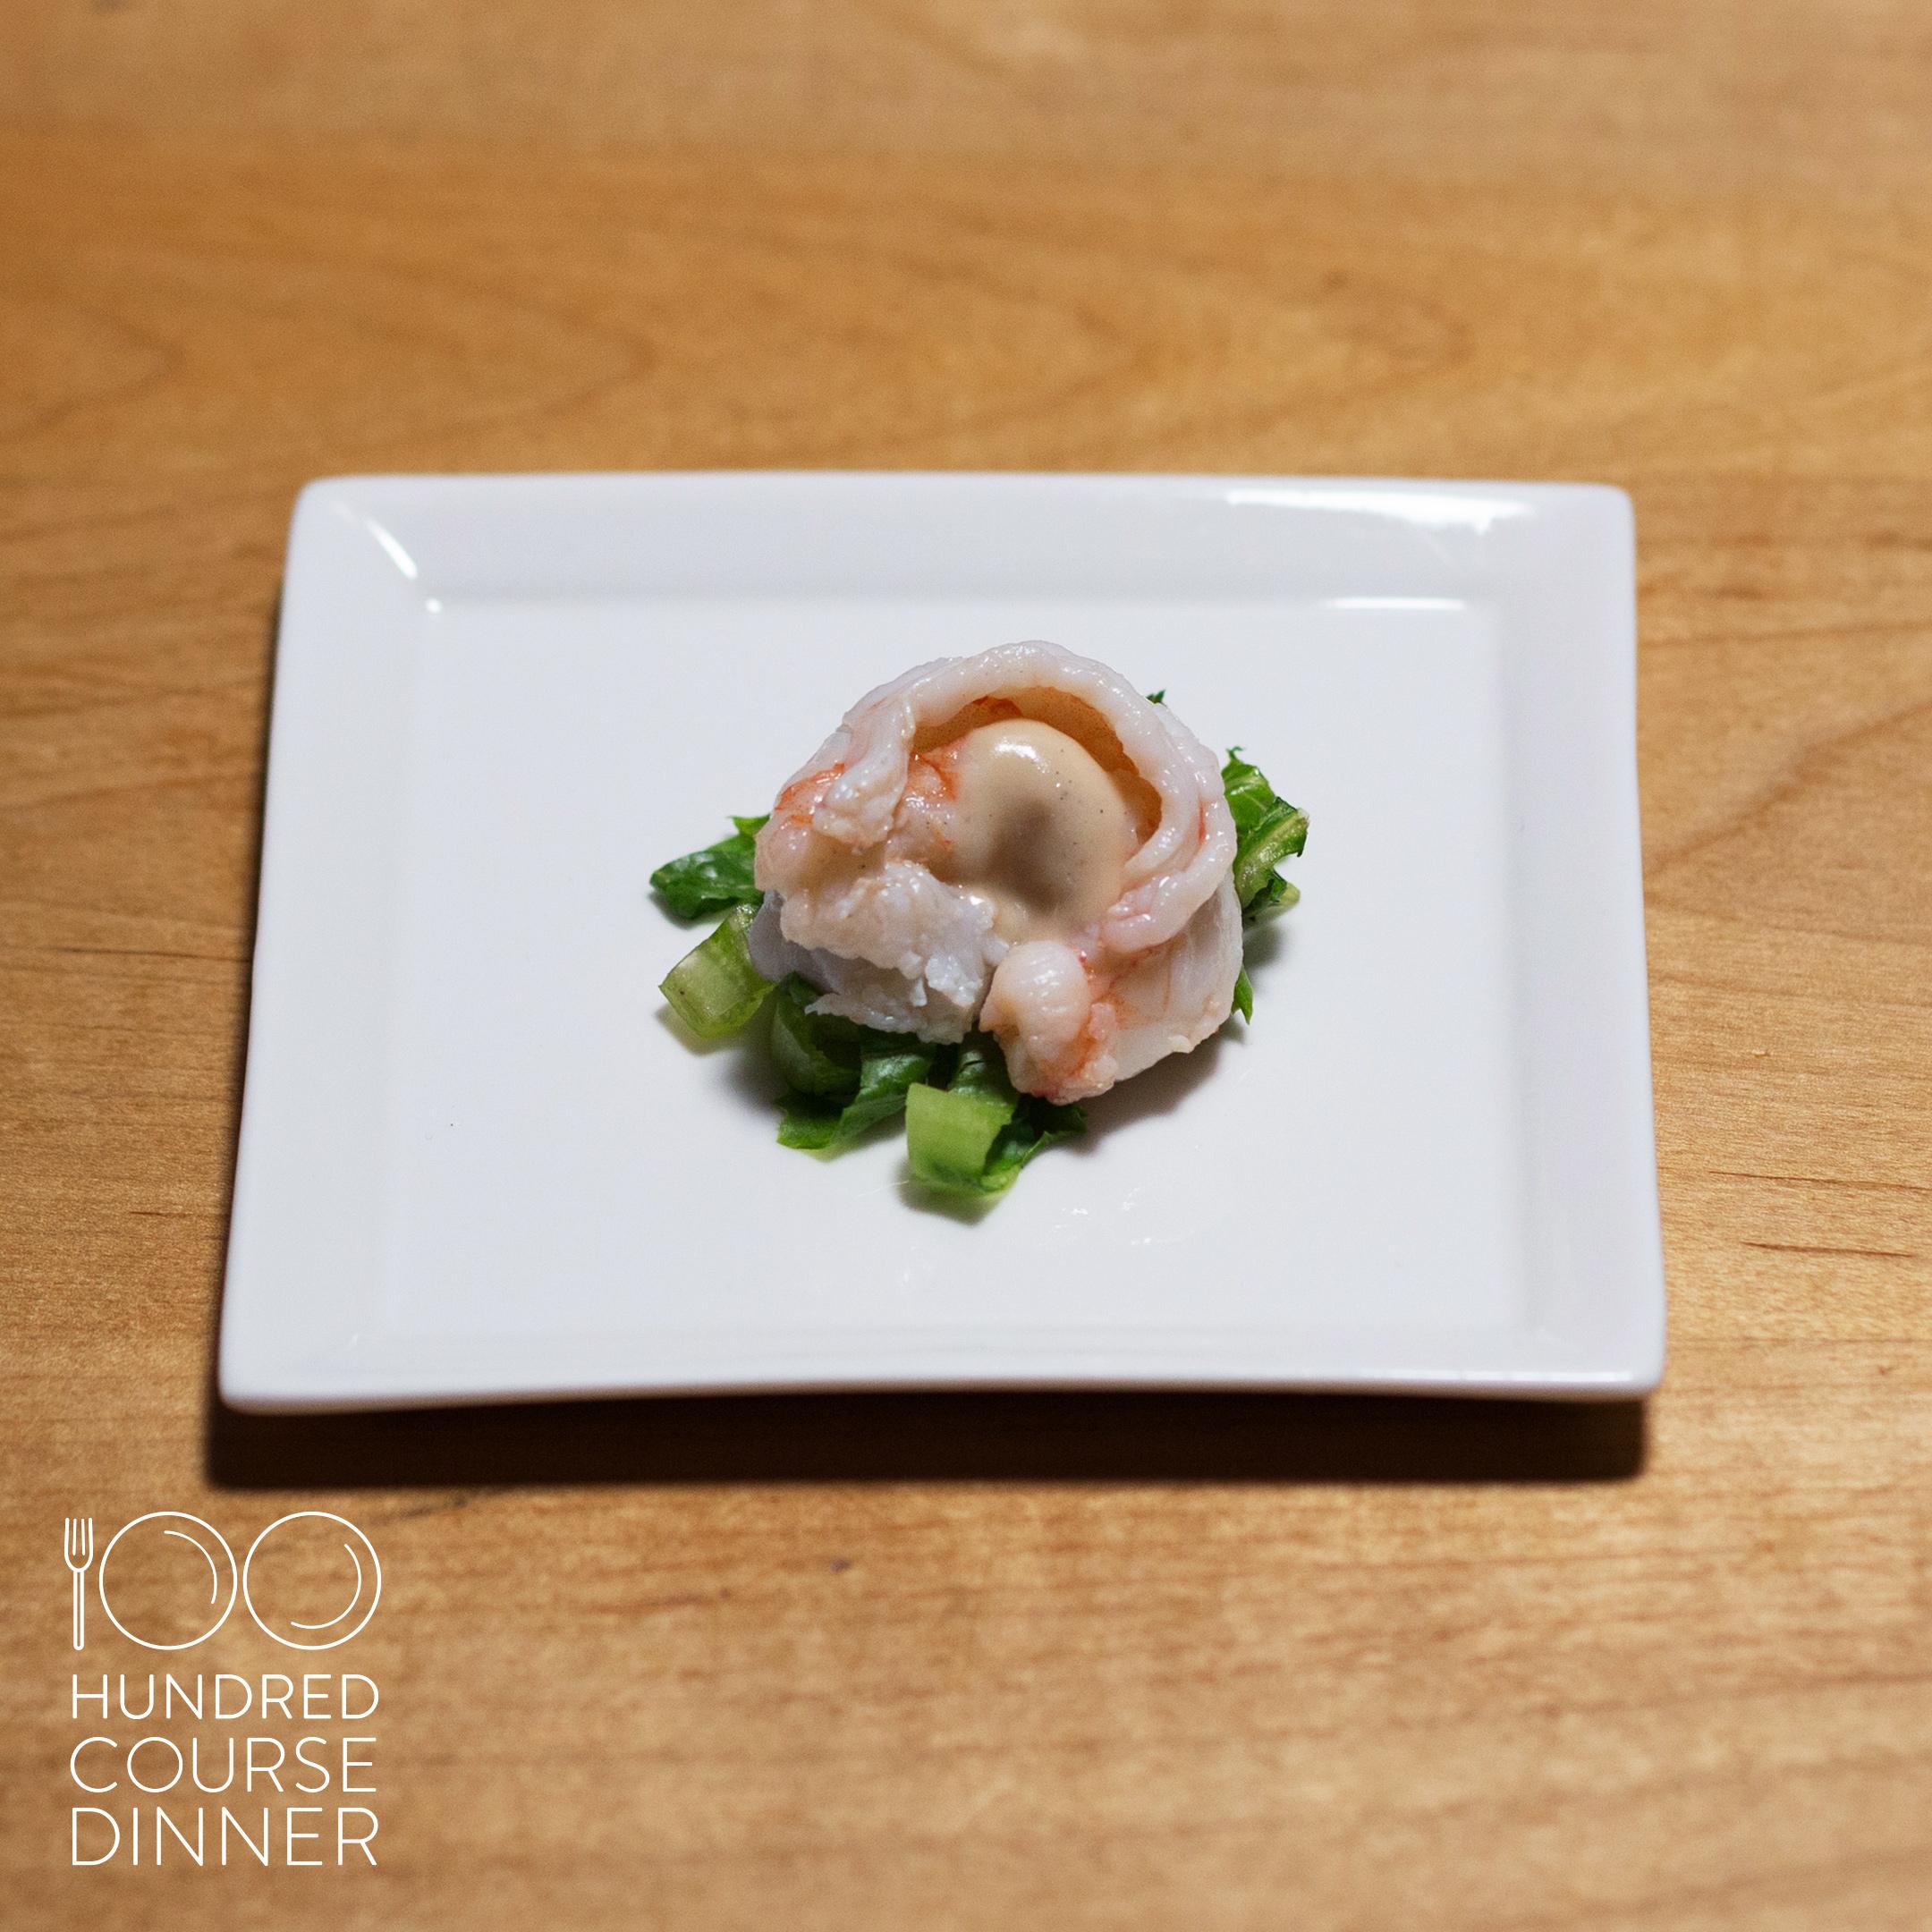 15-Poached-Shrimp-Bagna-Cauda-Charred-Lettuce_square_logo.jpg